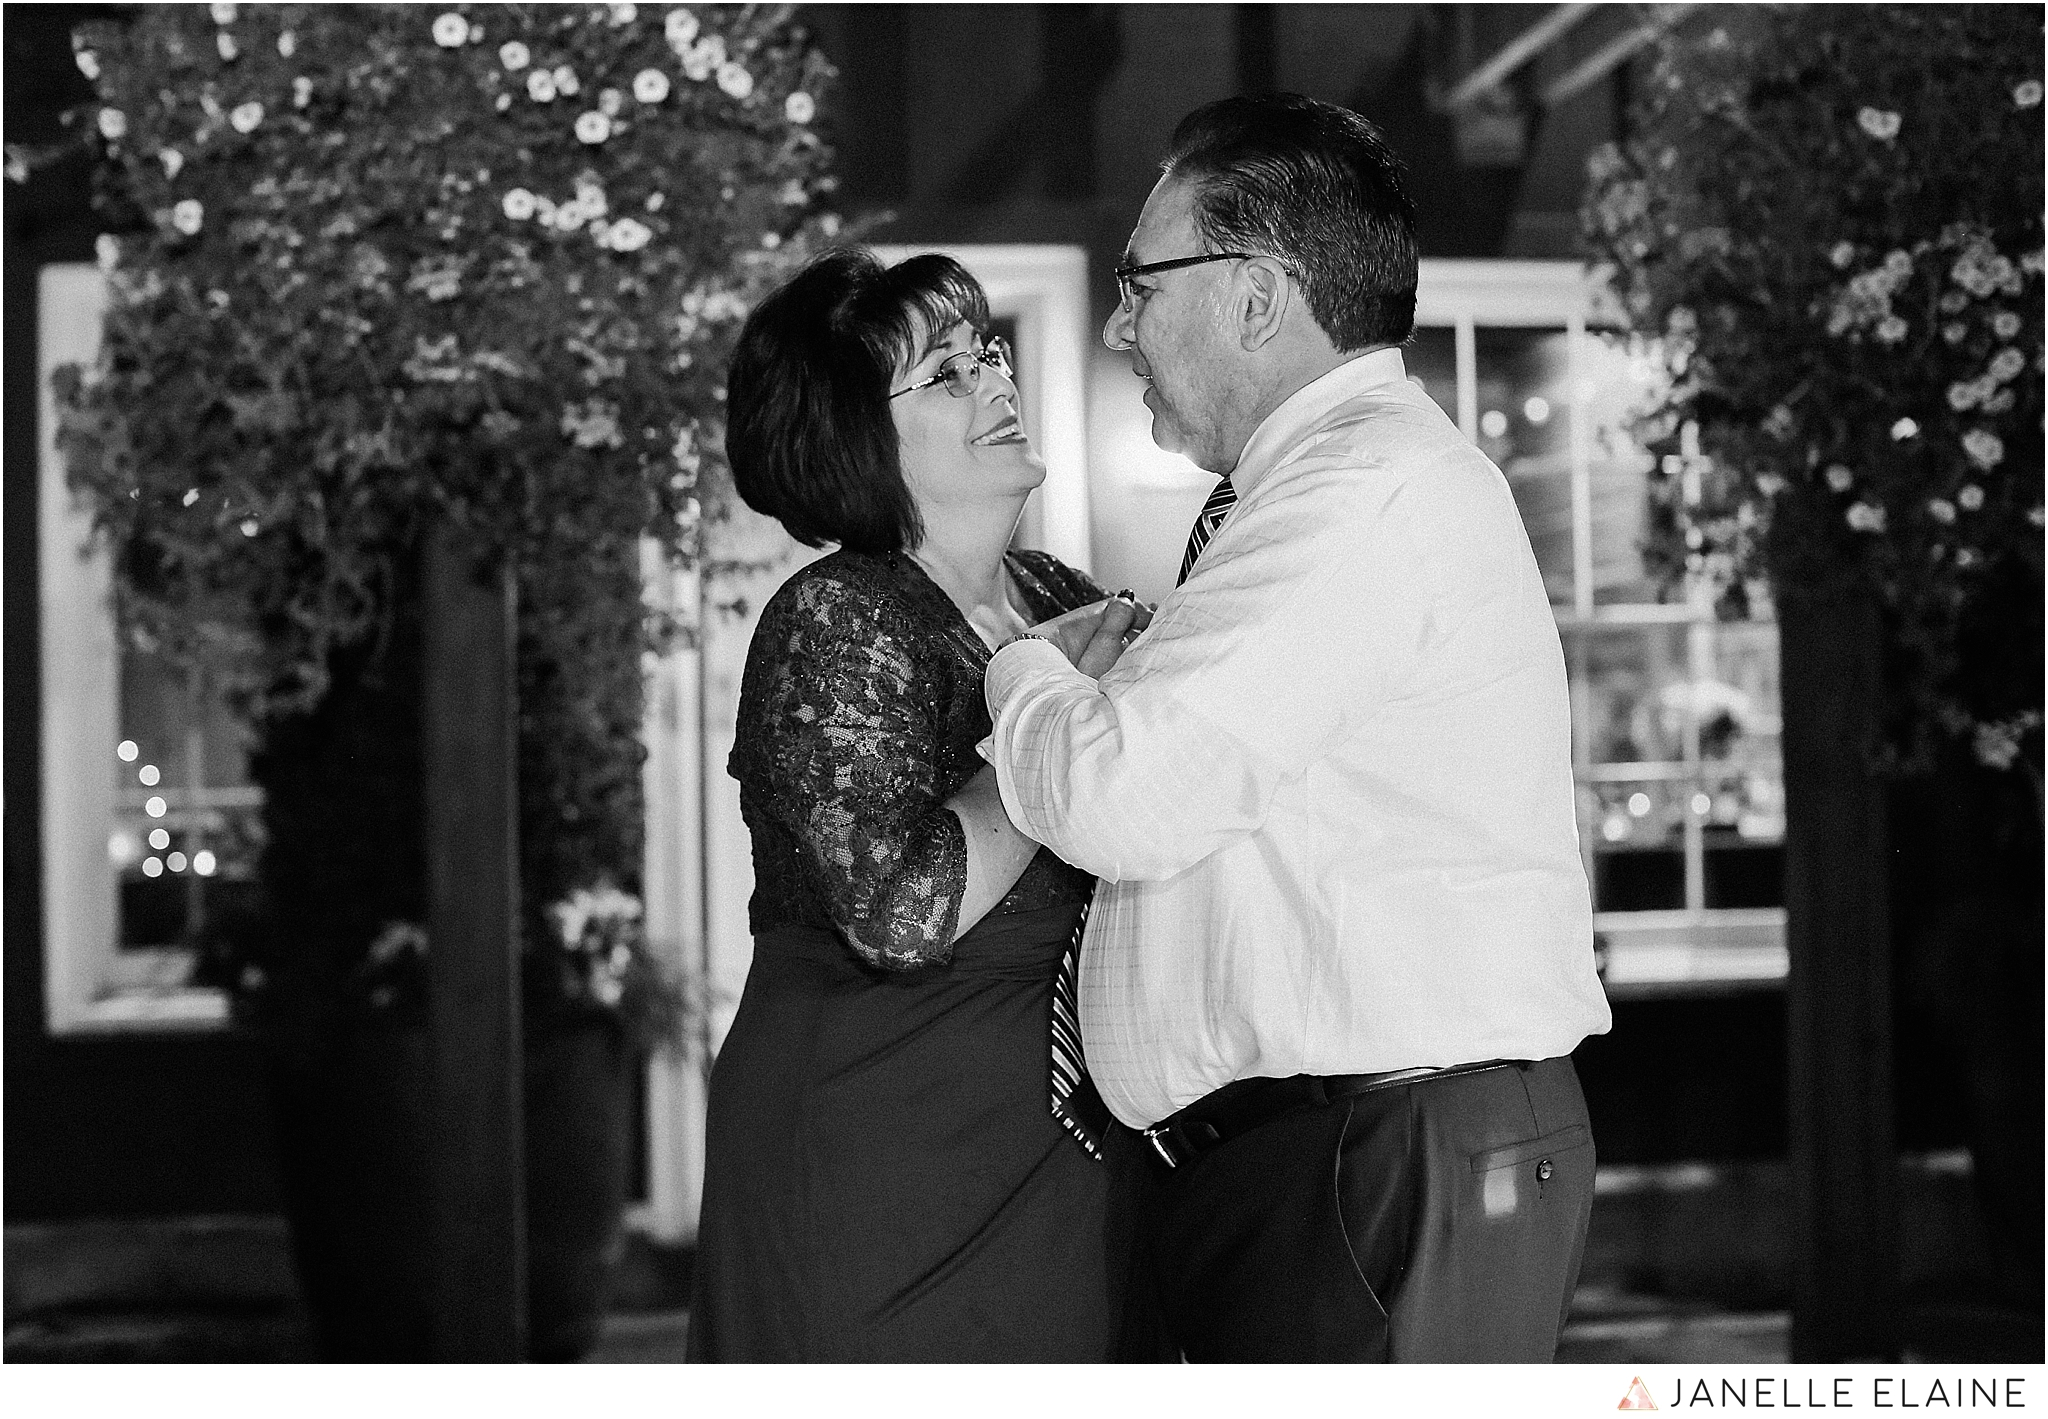 janelle elaine photography-professional wedding photographer-seattle-bellevue-robinswood house-301.jpg